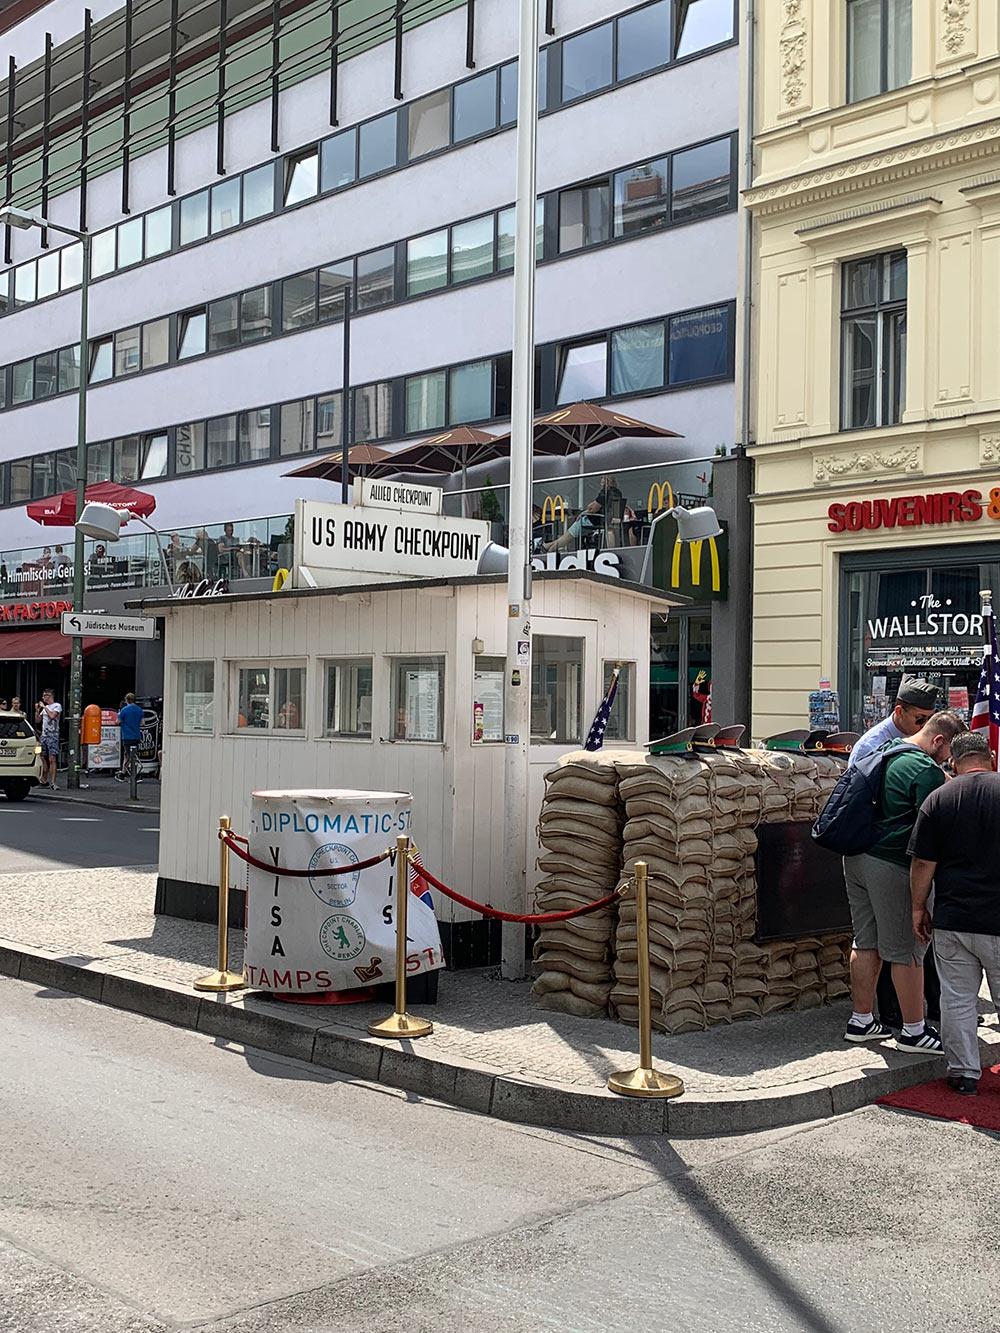 wceu 2019 15 - WordCamp Europe 2019 in Berlin - Tag 1 meines #InfluencerReisli